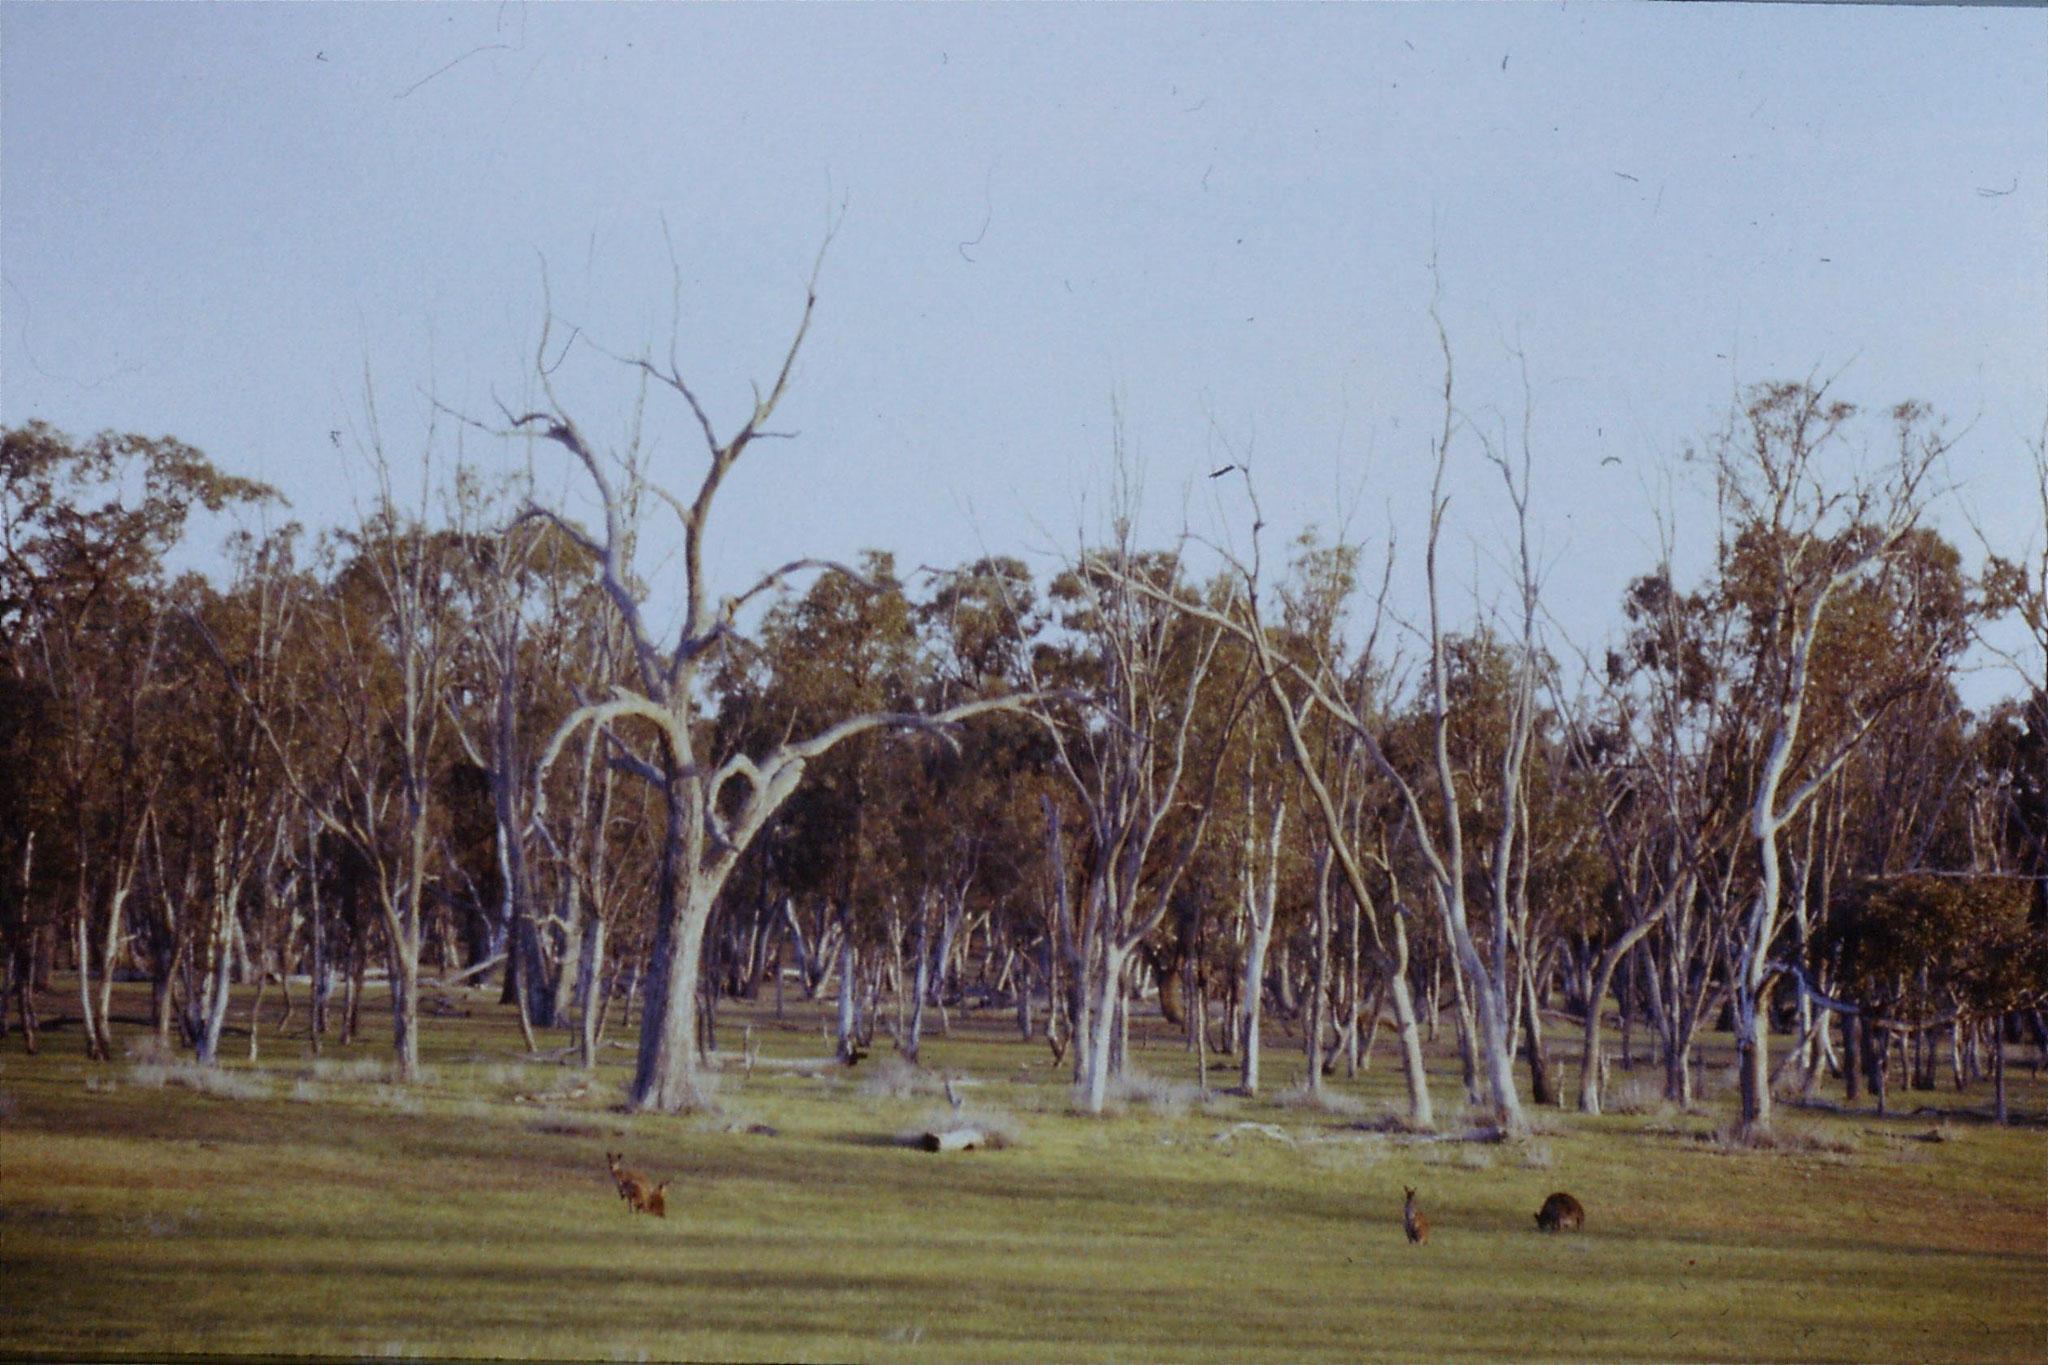 23/9/1990: 4: Western grey kangaroos